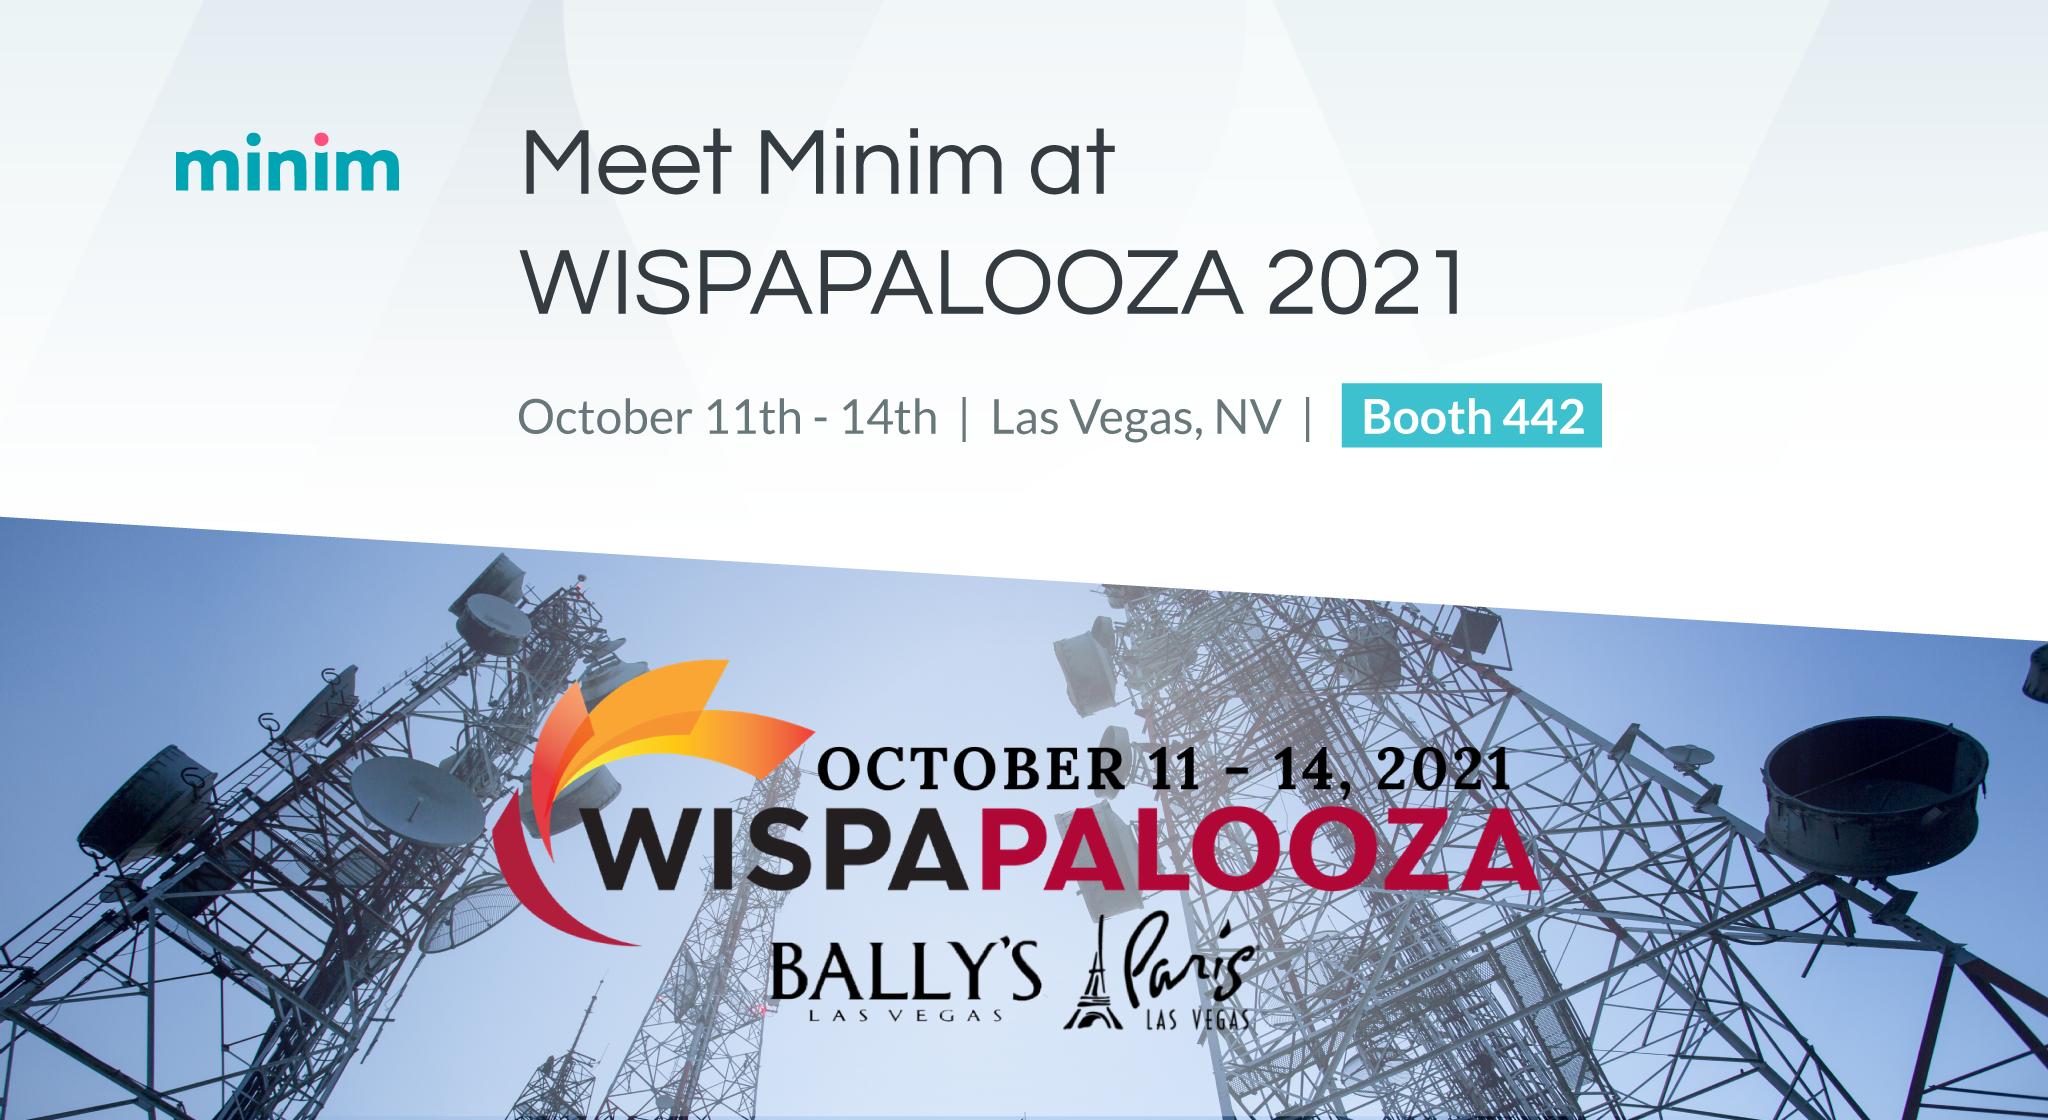 "<img src=""minim-wispapalooza-2021-las-vegas.jpg"" alt=""Minim at WISPAPALOOZA 2021 in Las Vegas"" />"